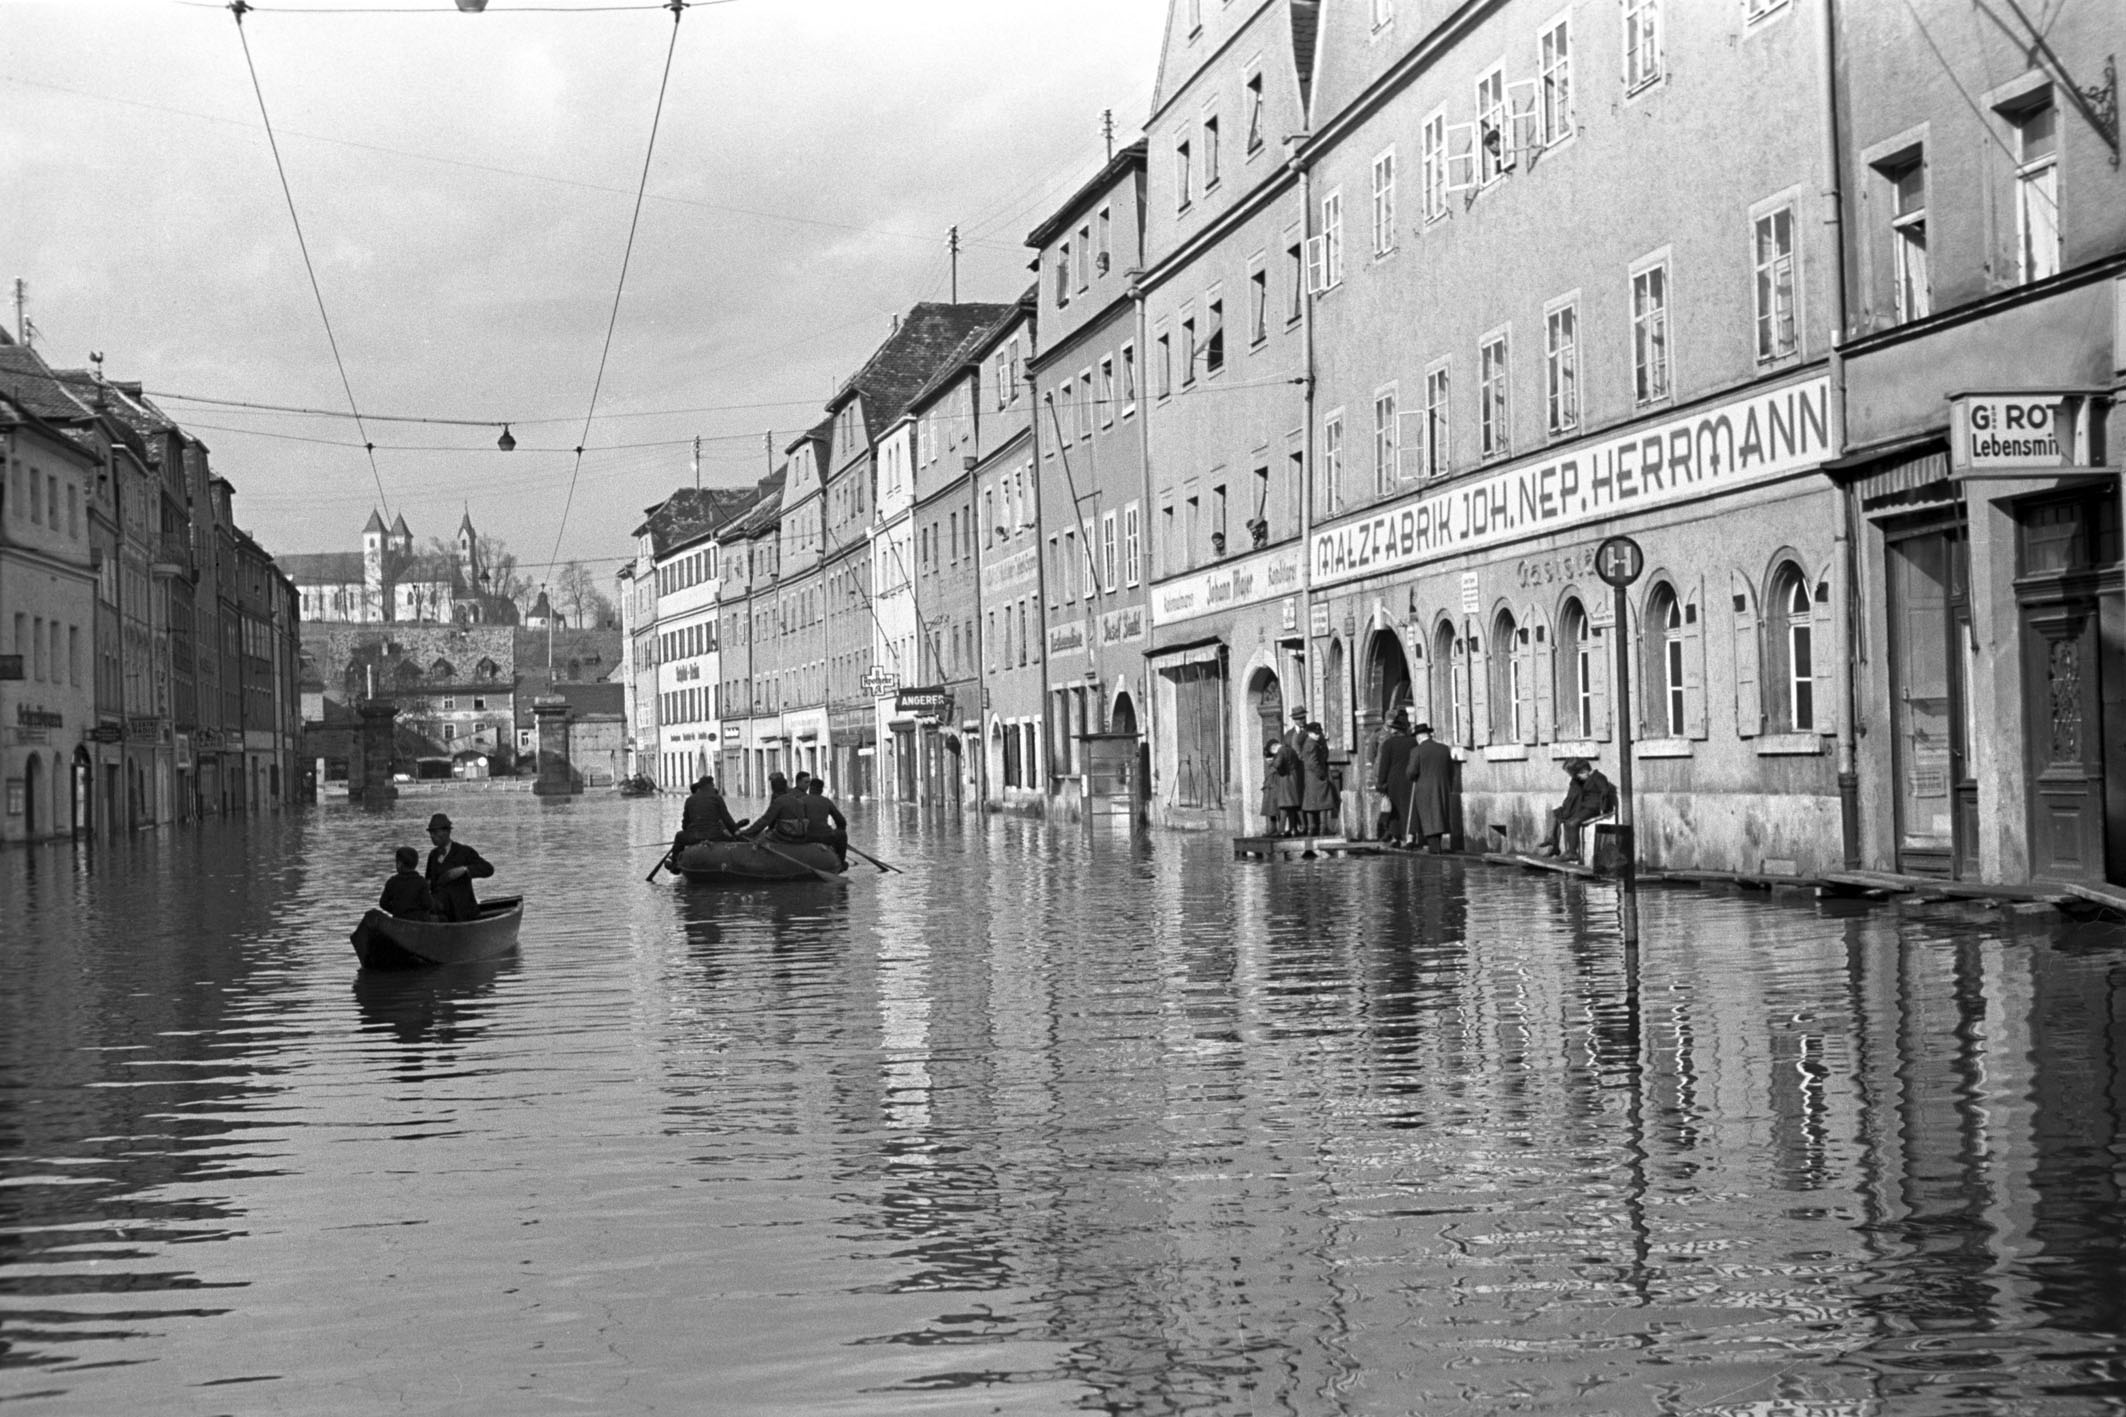 Rothdauscher Regensburg